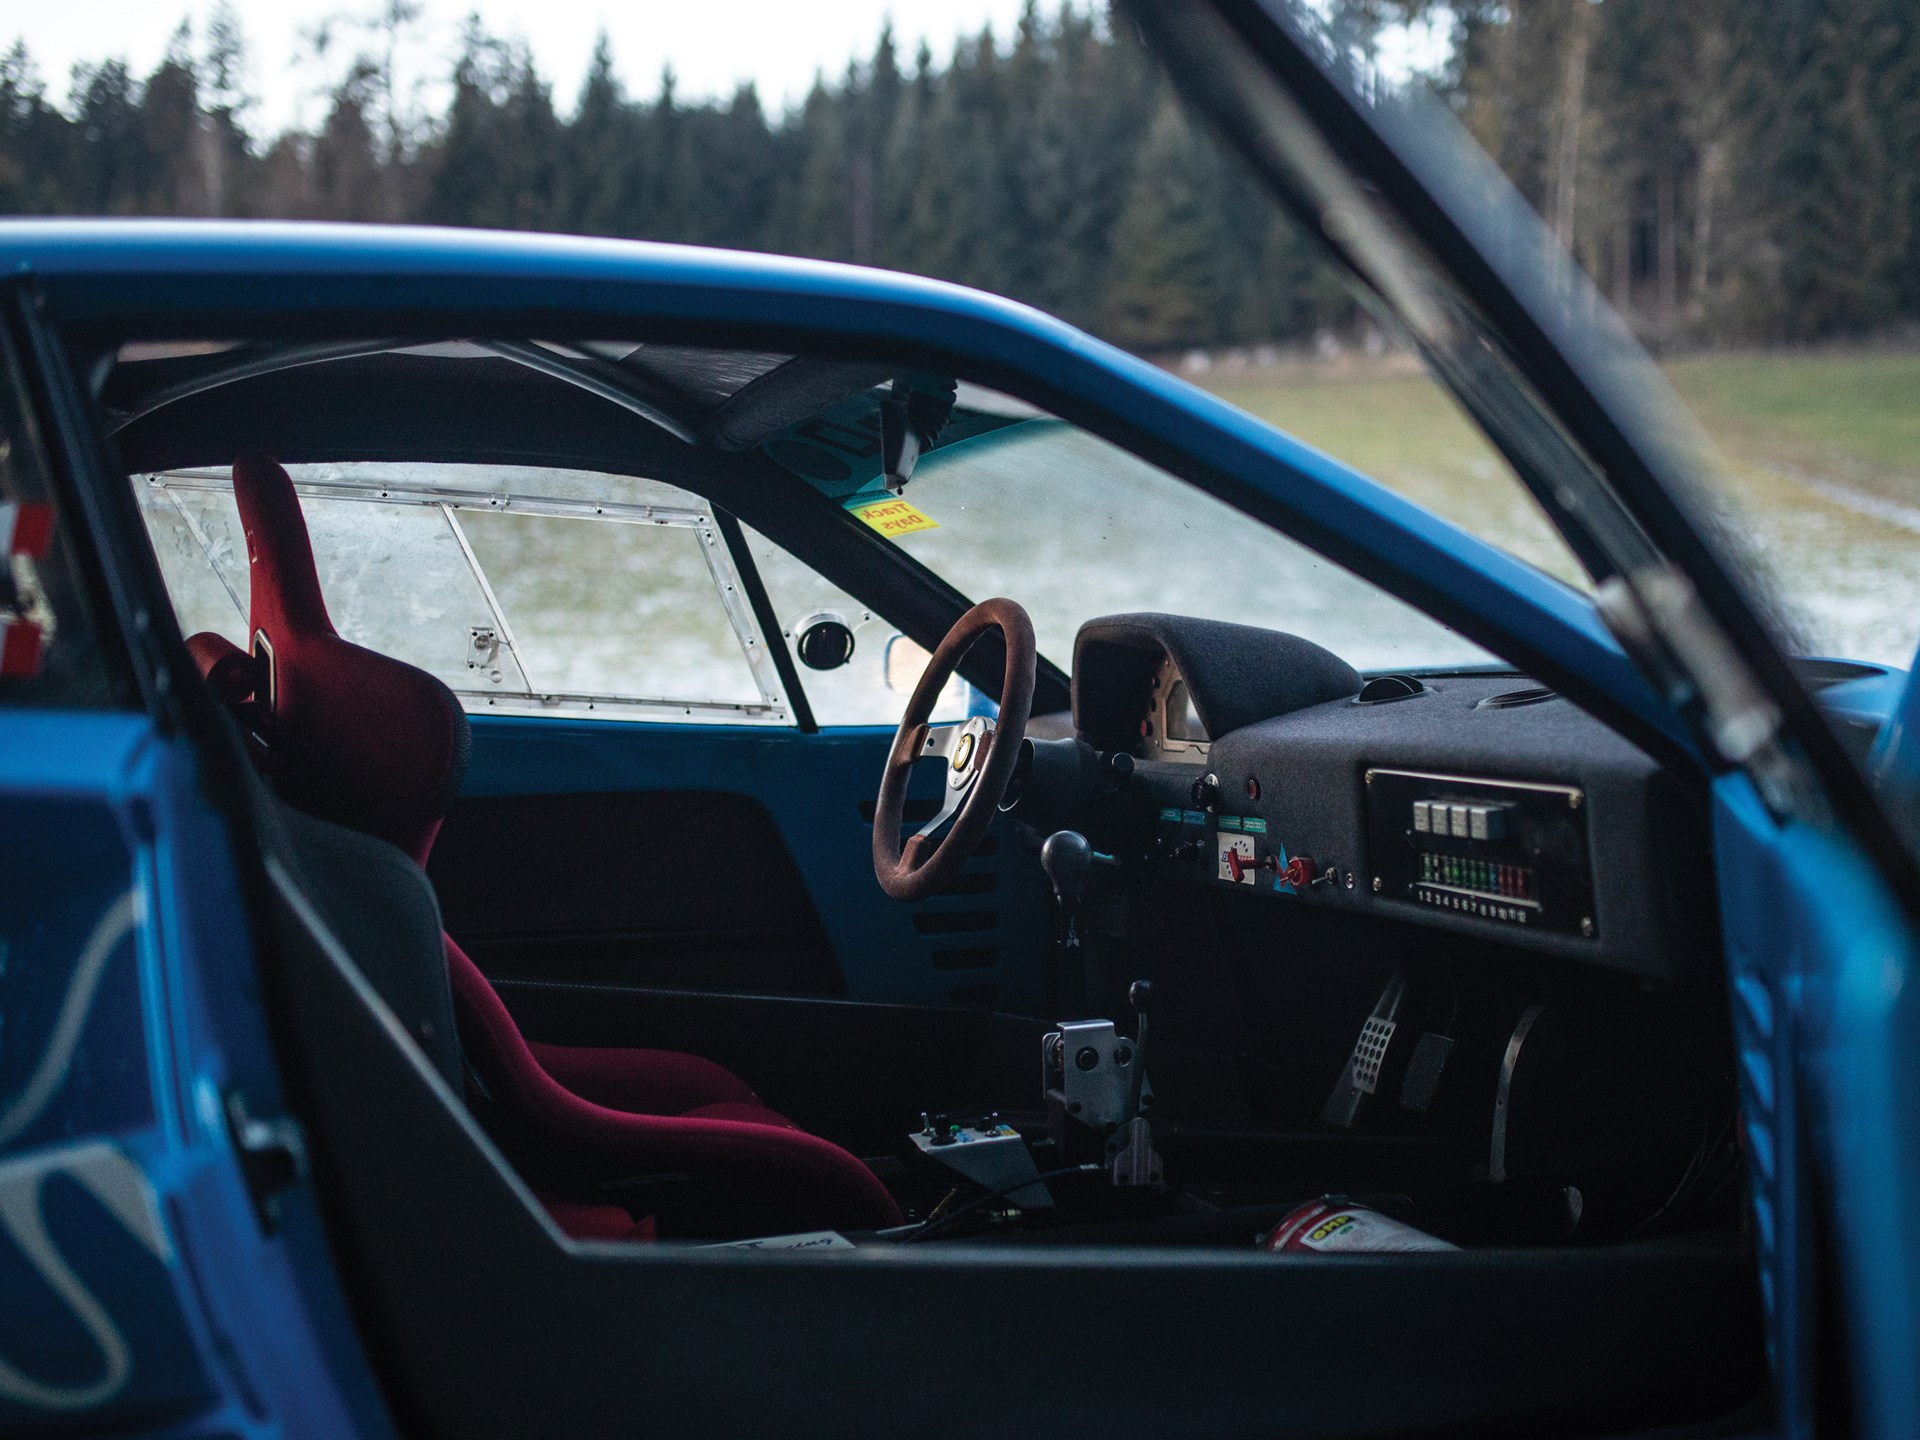 1987 Ferrari F40 LM interior passenger side